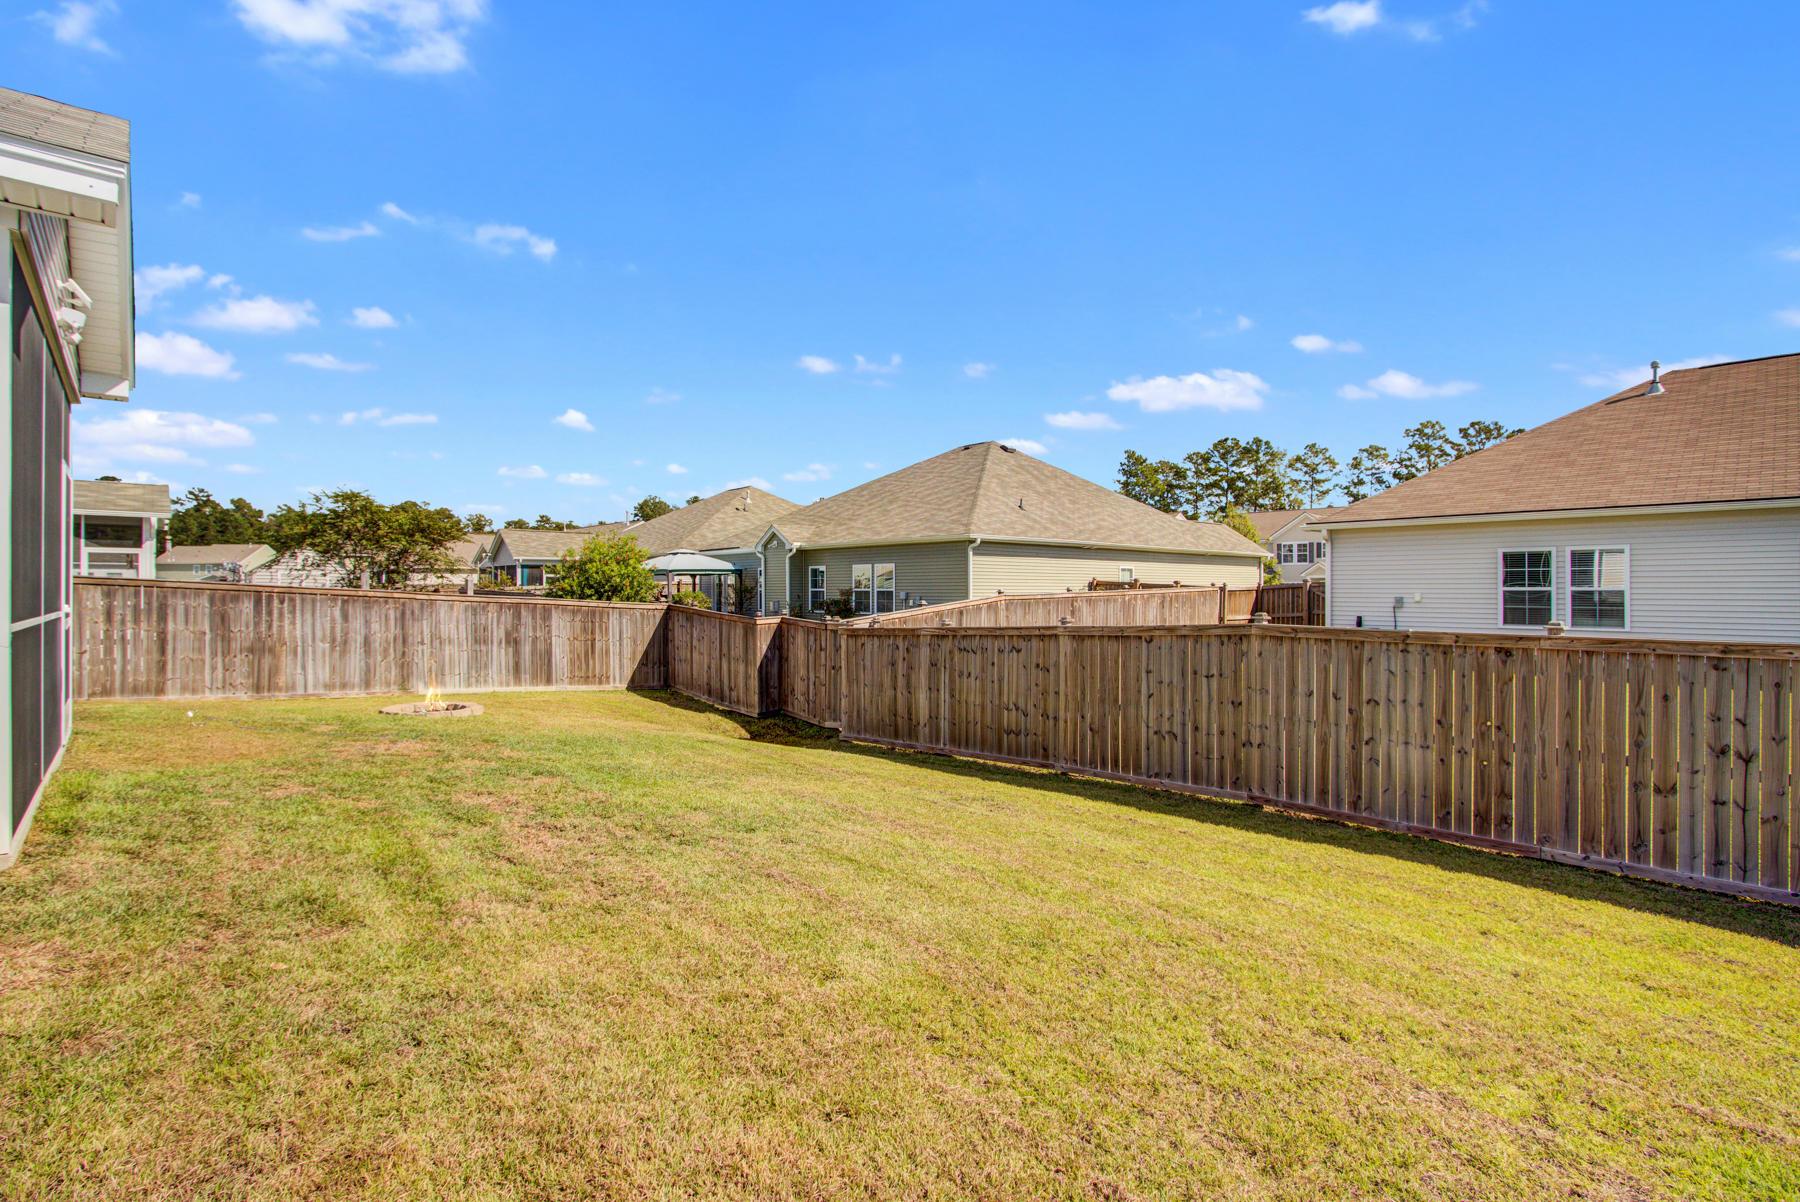 Brickhope Plantation Homes For Sale - 616 Zinnia, Goose Creek, SC - 19